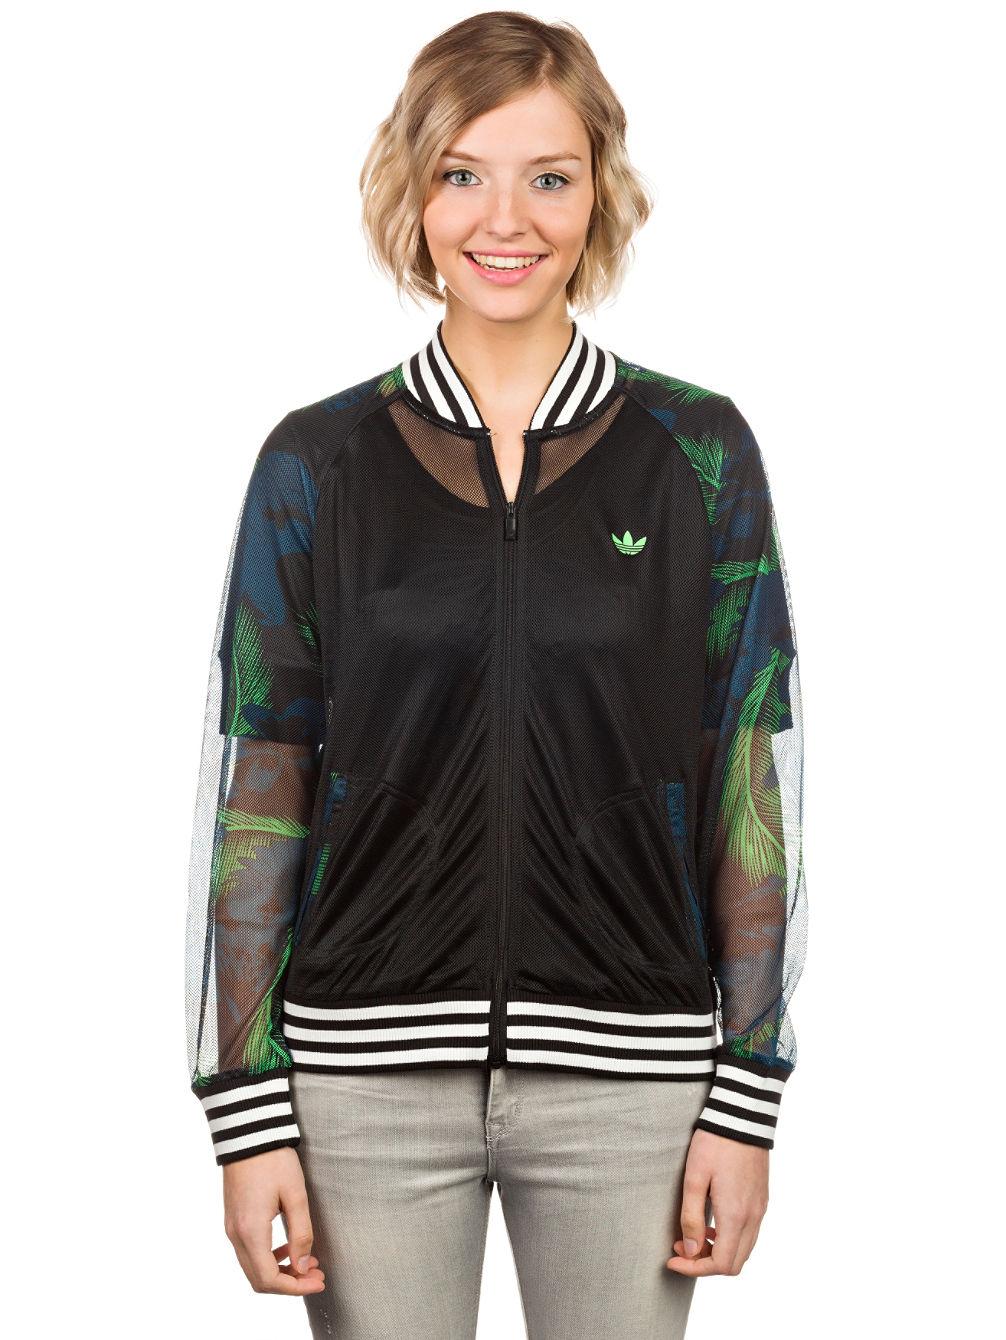 39b93aec3a5 Buy adidas Originals Hawaii Superstar Mesh Track Top Jacket online ...